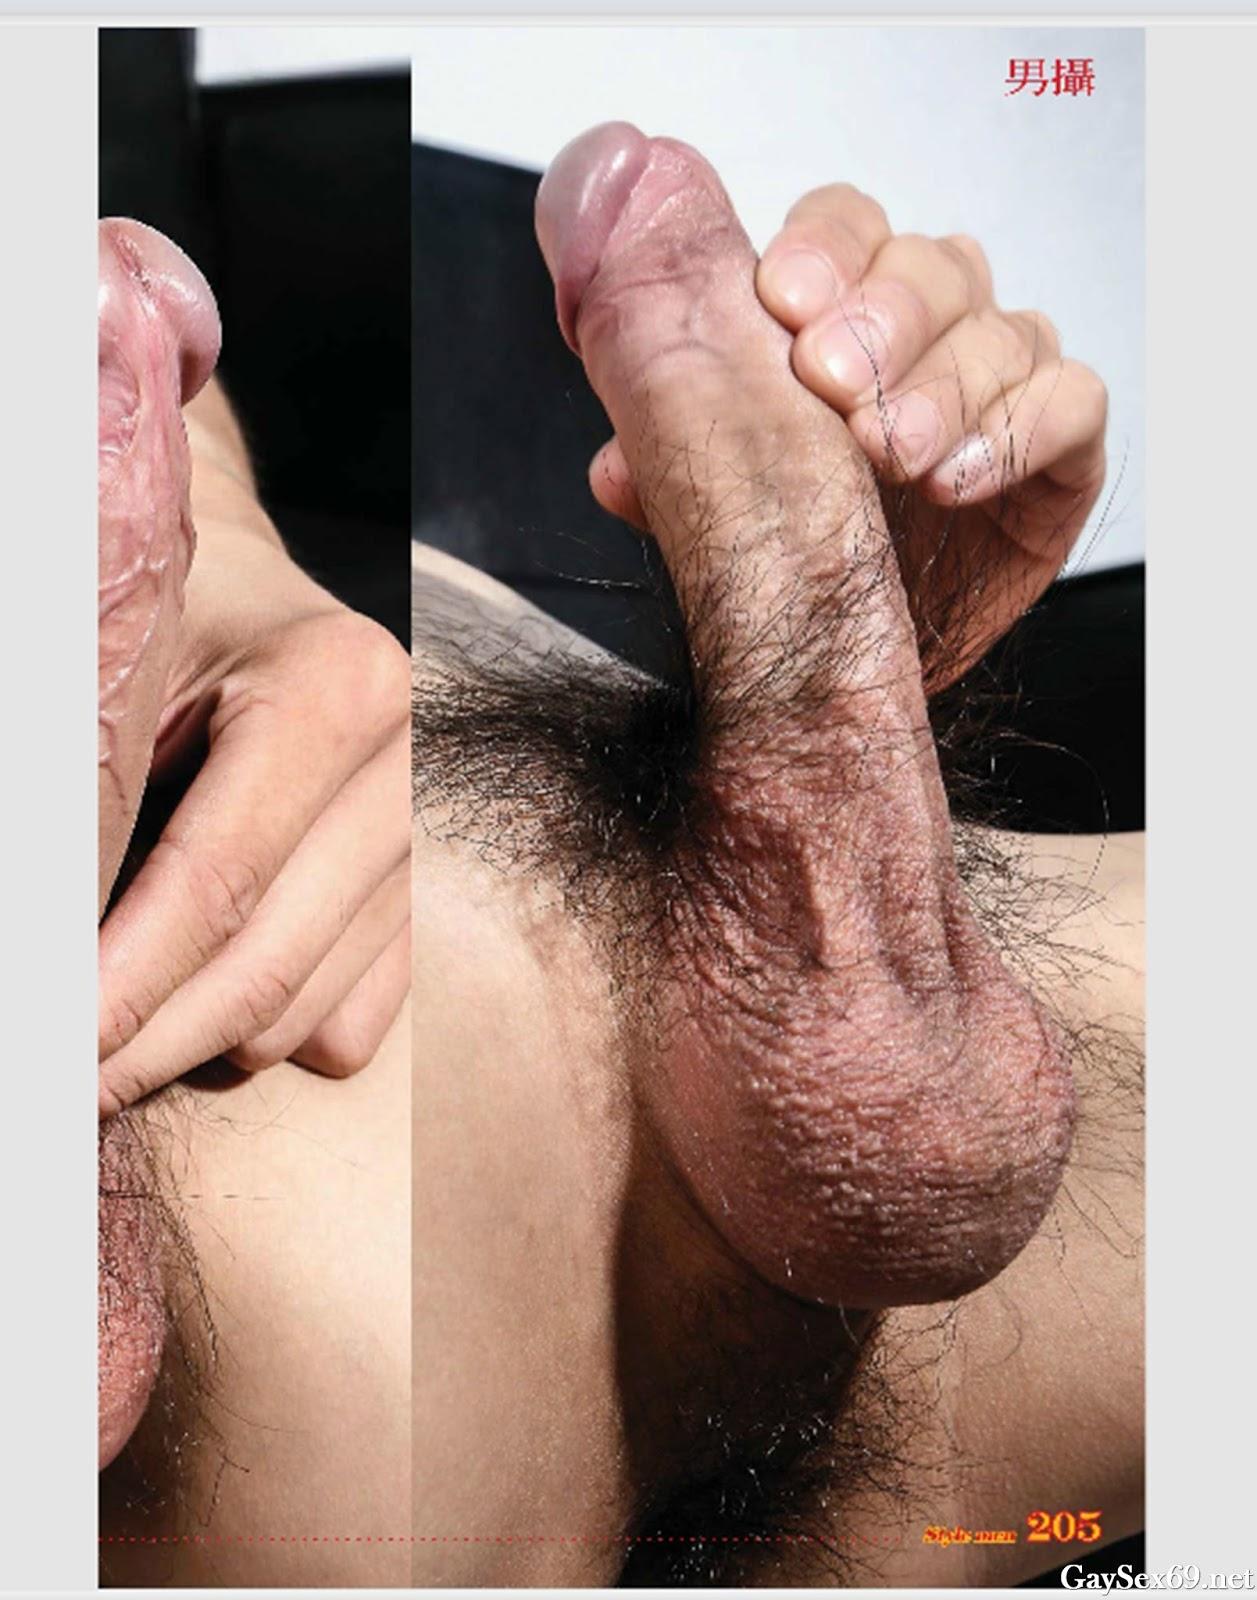 [MAGAZINE] Style Men 86 - SEXGAY.video